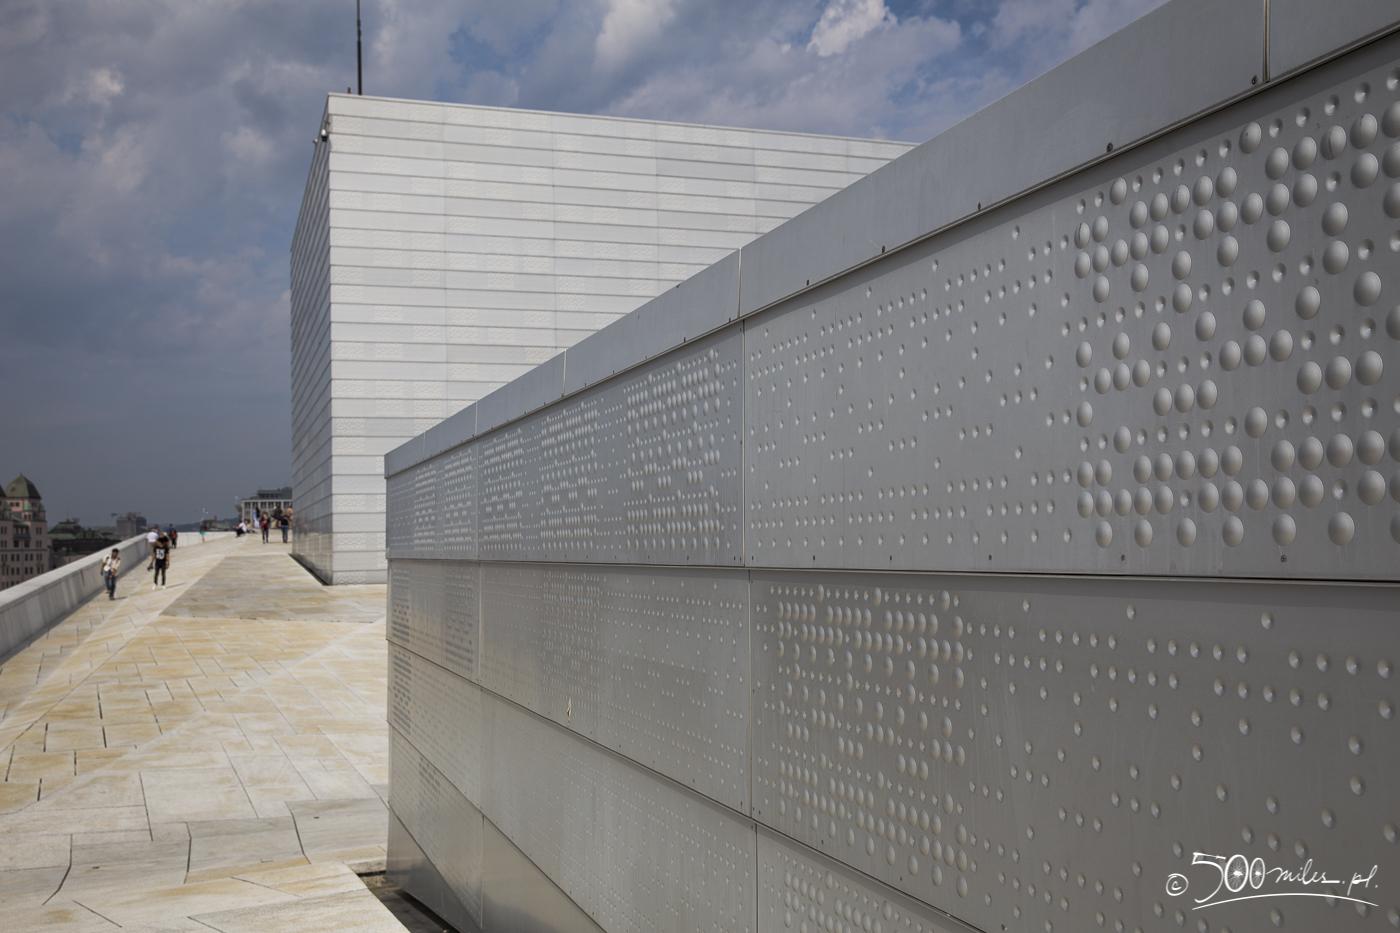 Oslo - Opera - roof